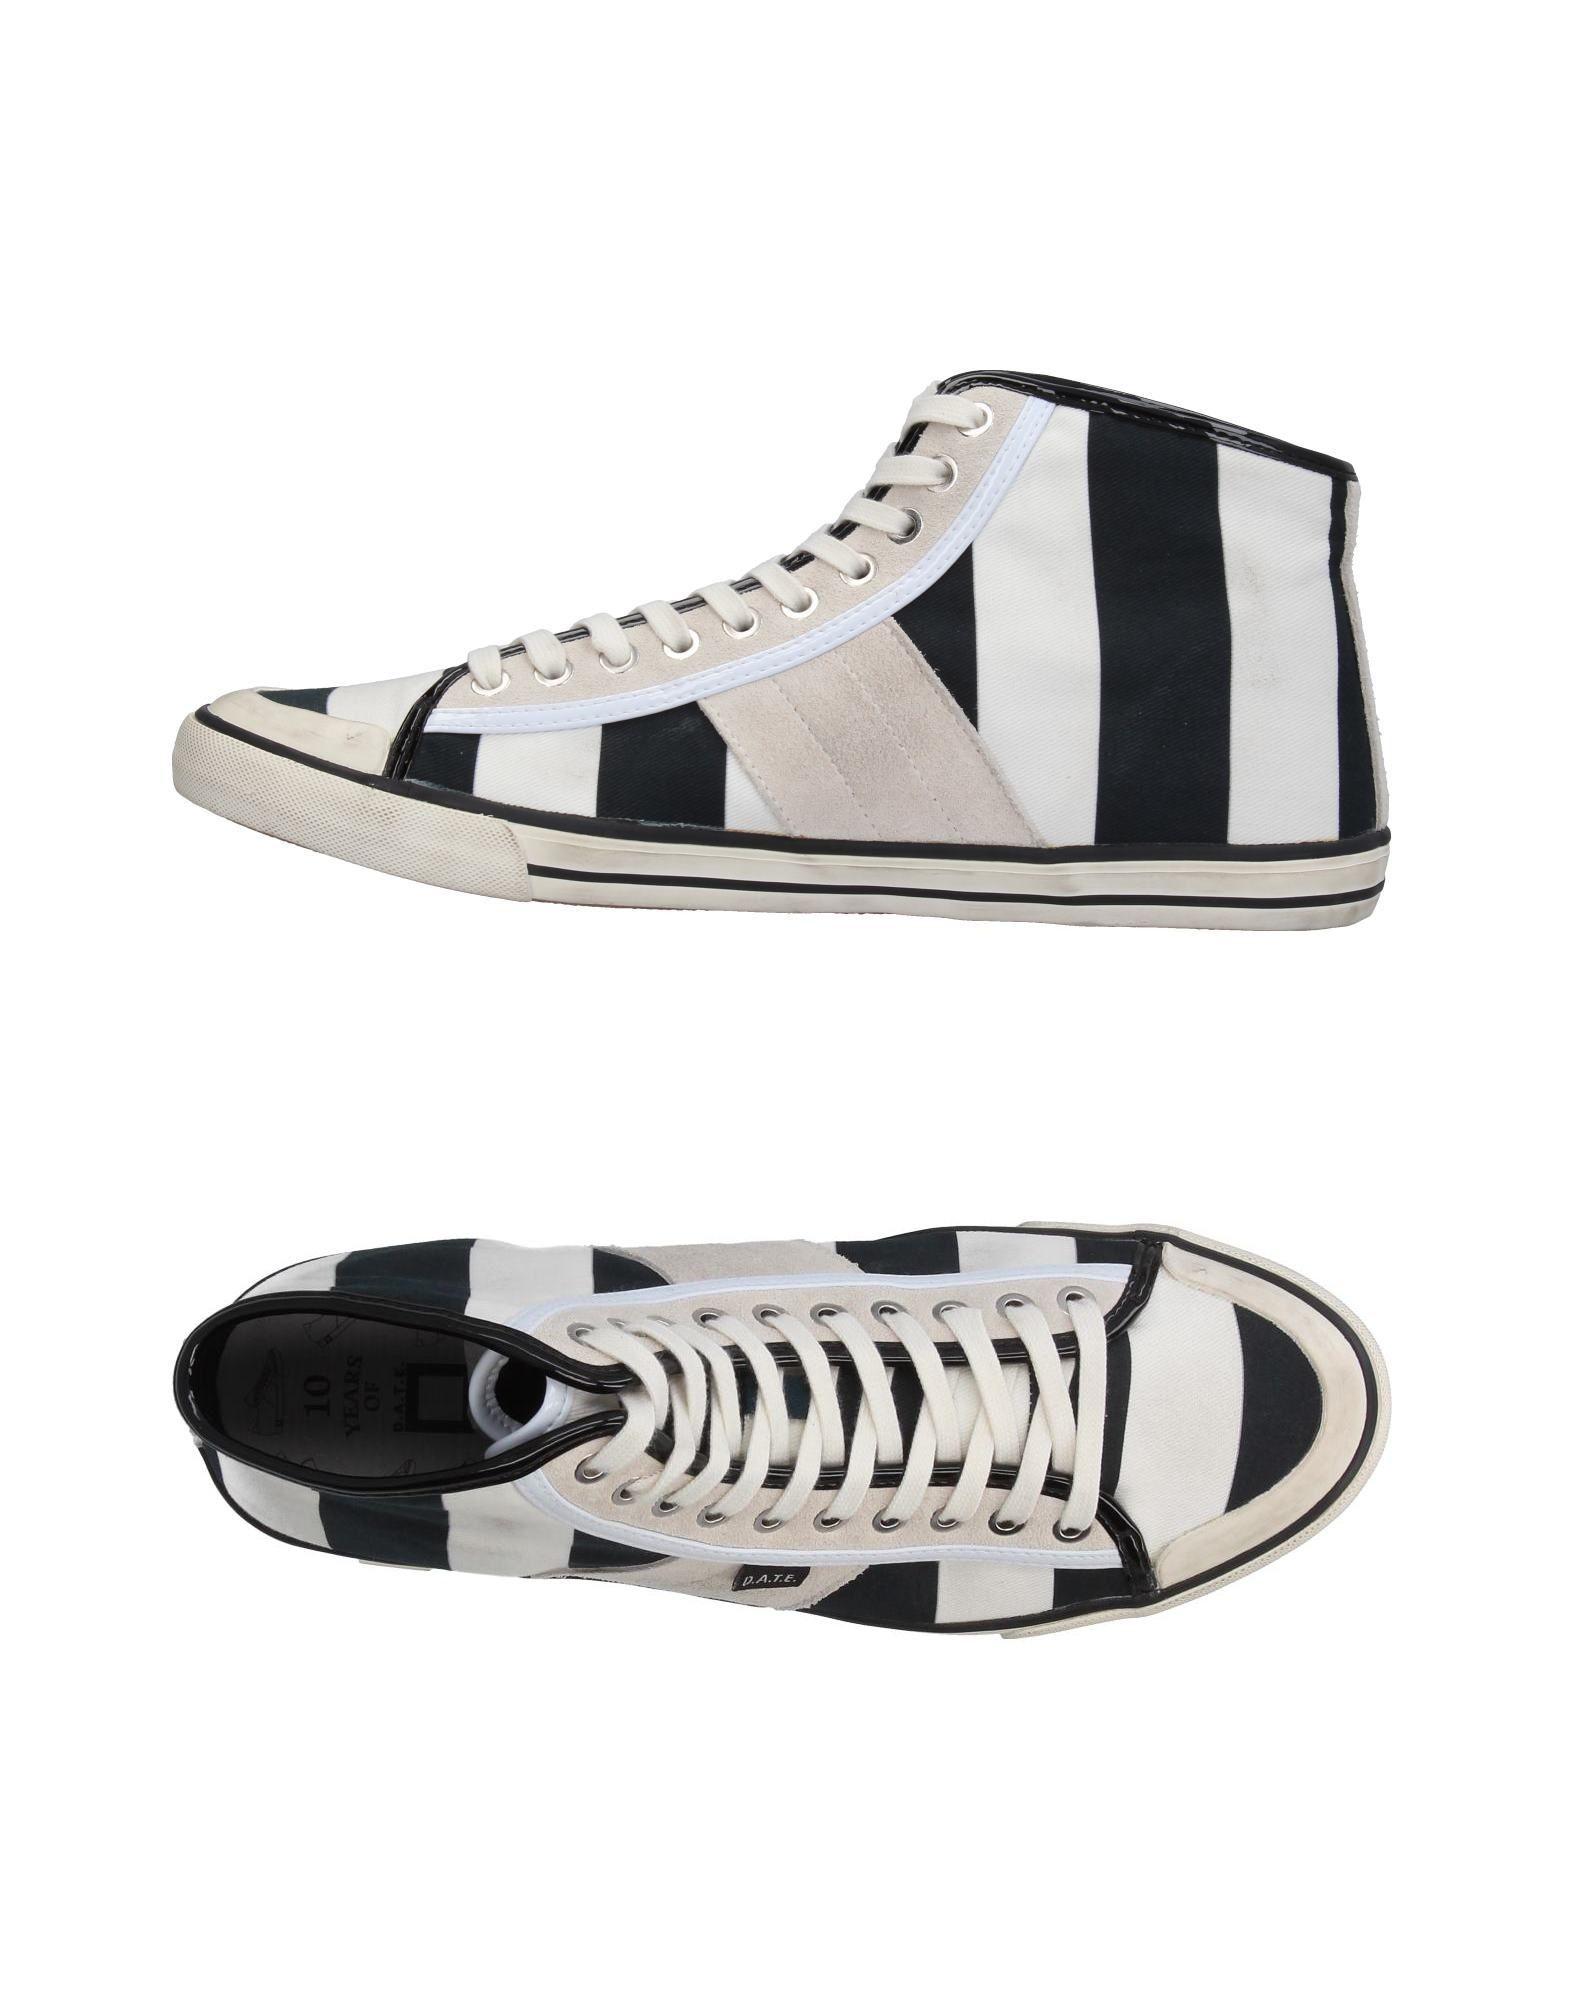 Moda Sneakers D.A.T.E. D.A.T.E. Sneakers Uomo - 11175944EF e05418